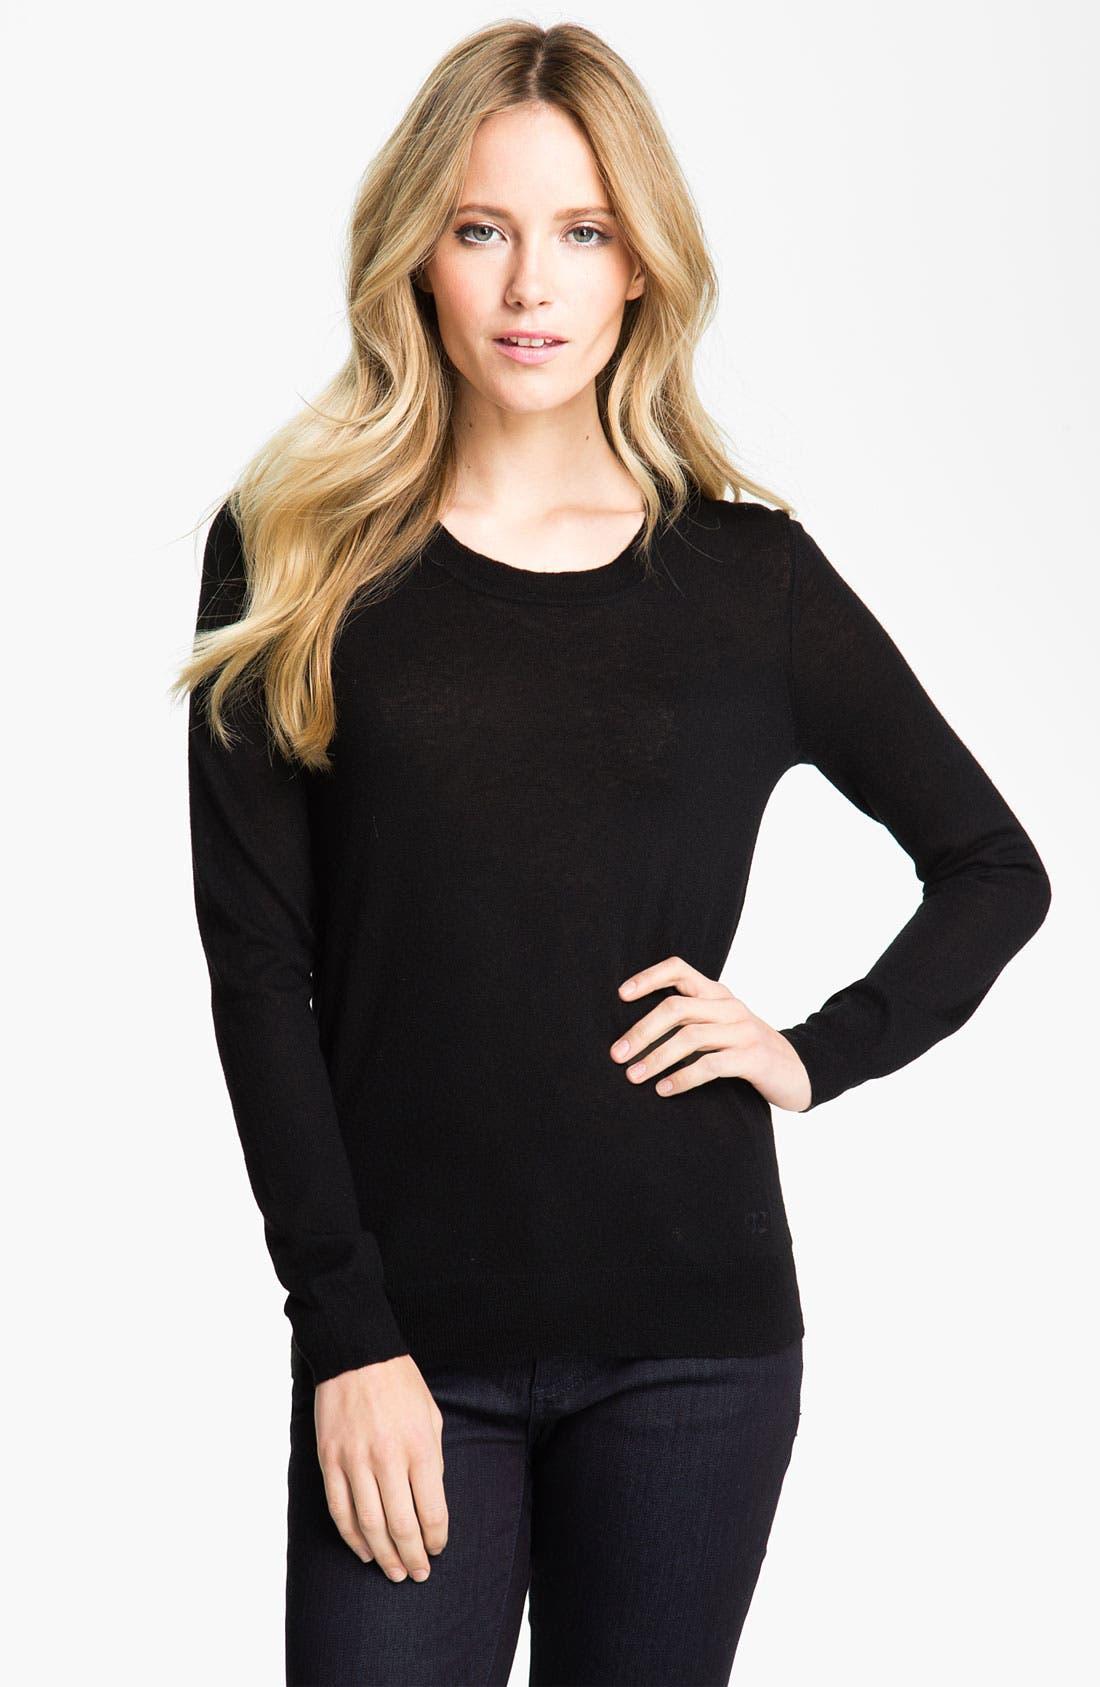 Alternate Image 1 Selected - Tory Burch 'Iberia' Cashmere Logo Sweater